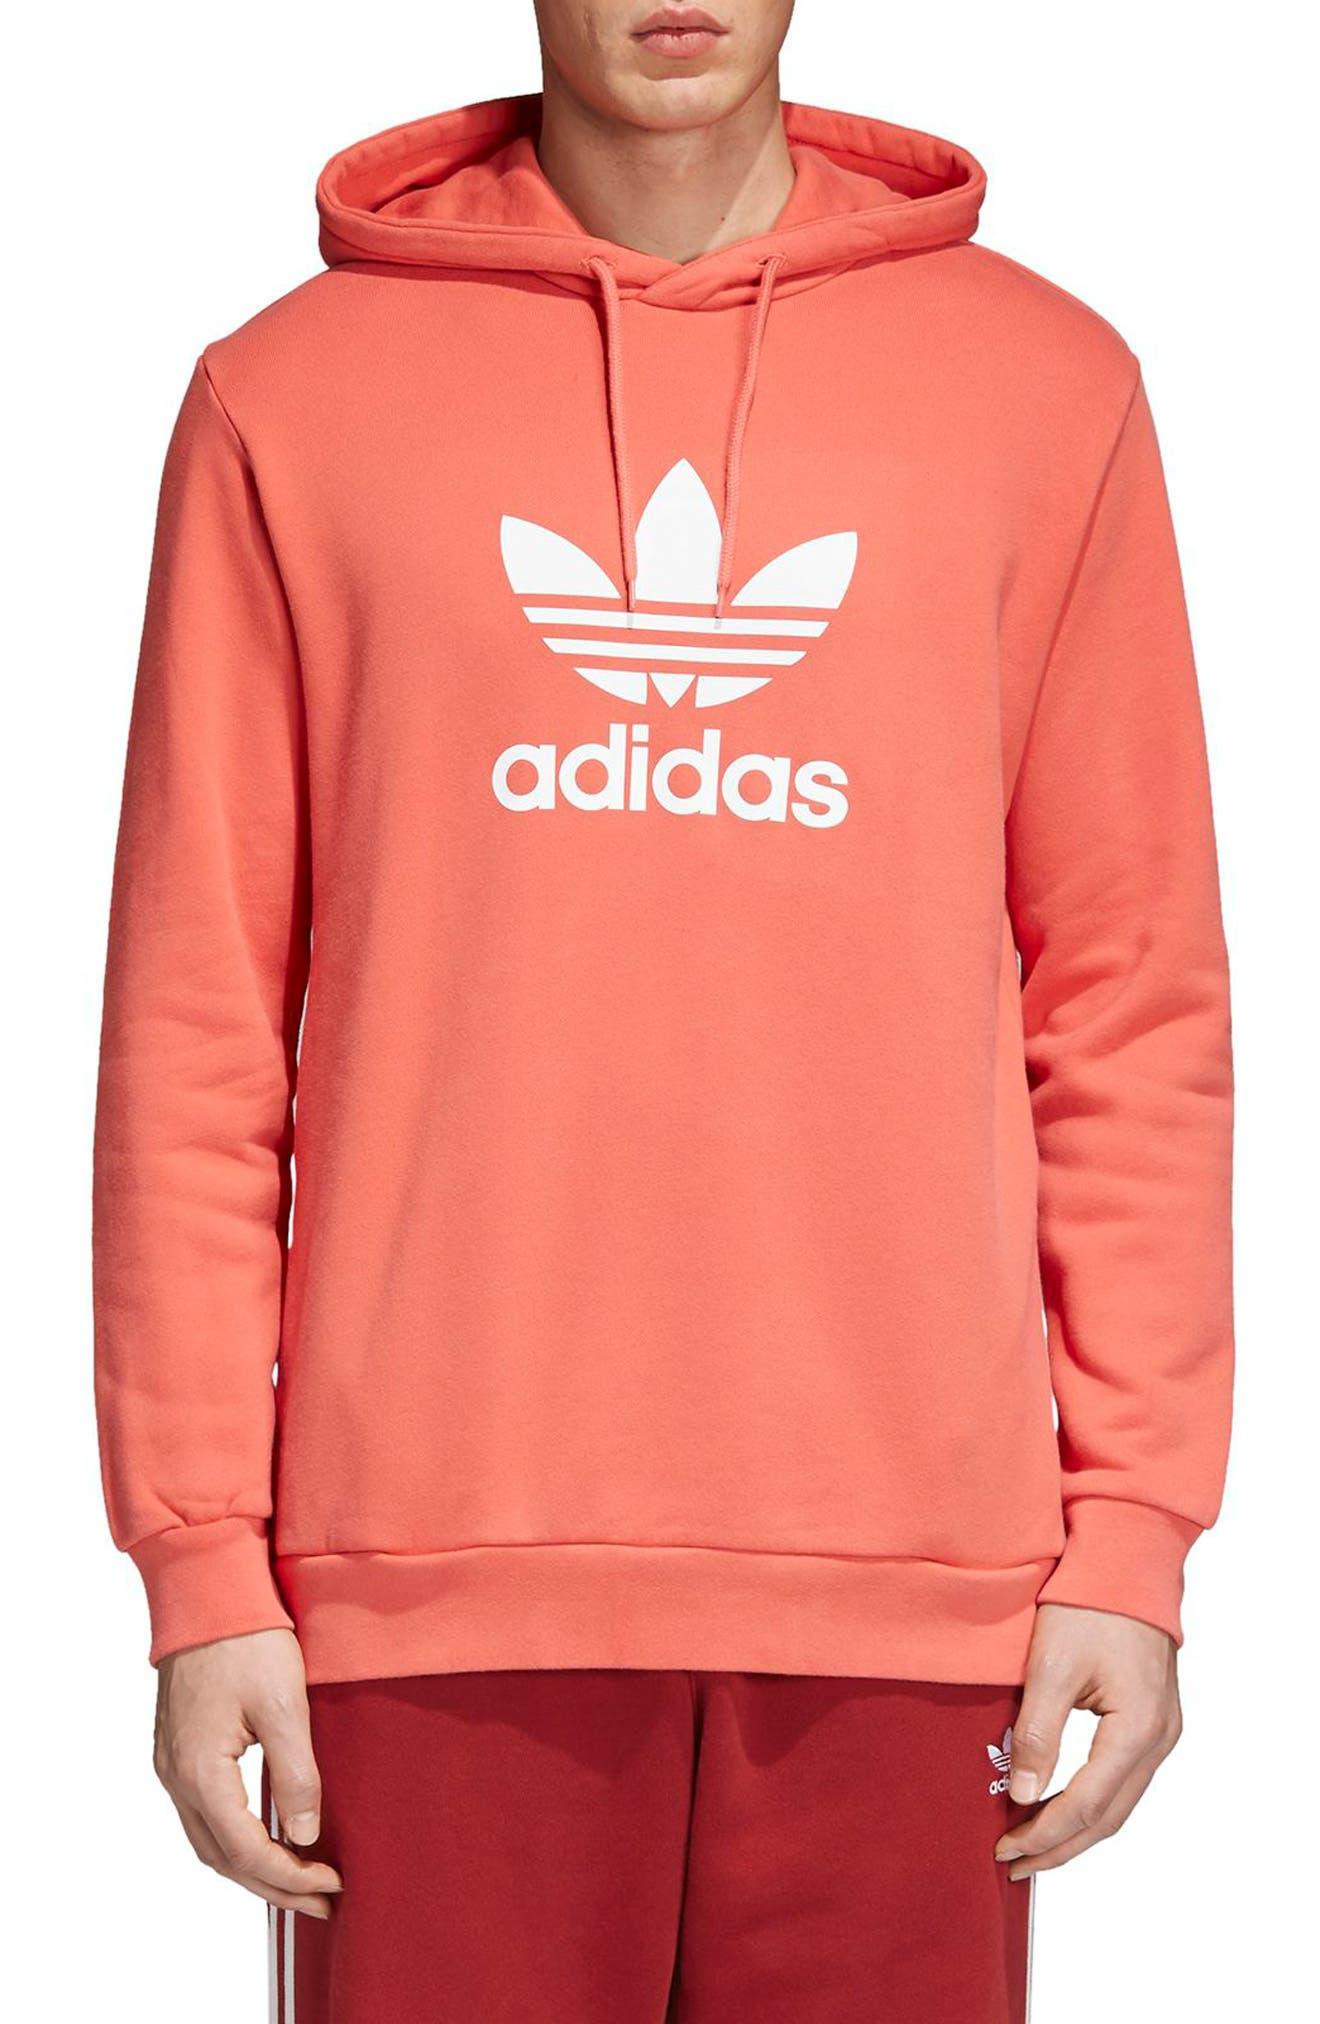 Sweatshirts & Hoodies adidas for Men: Activewear, Shoes & Watches |  Nordstrom